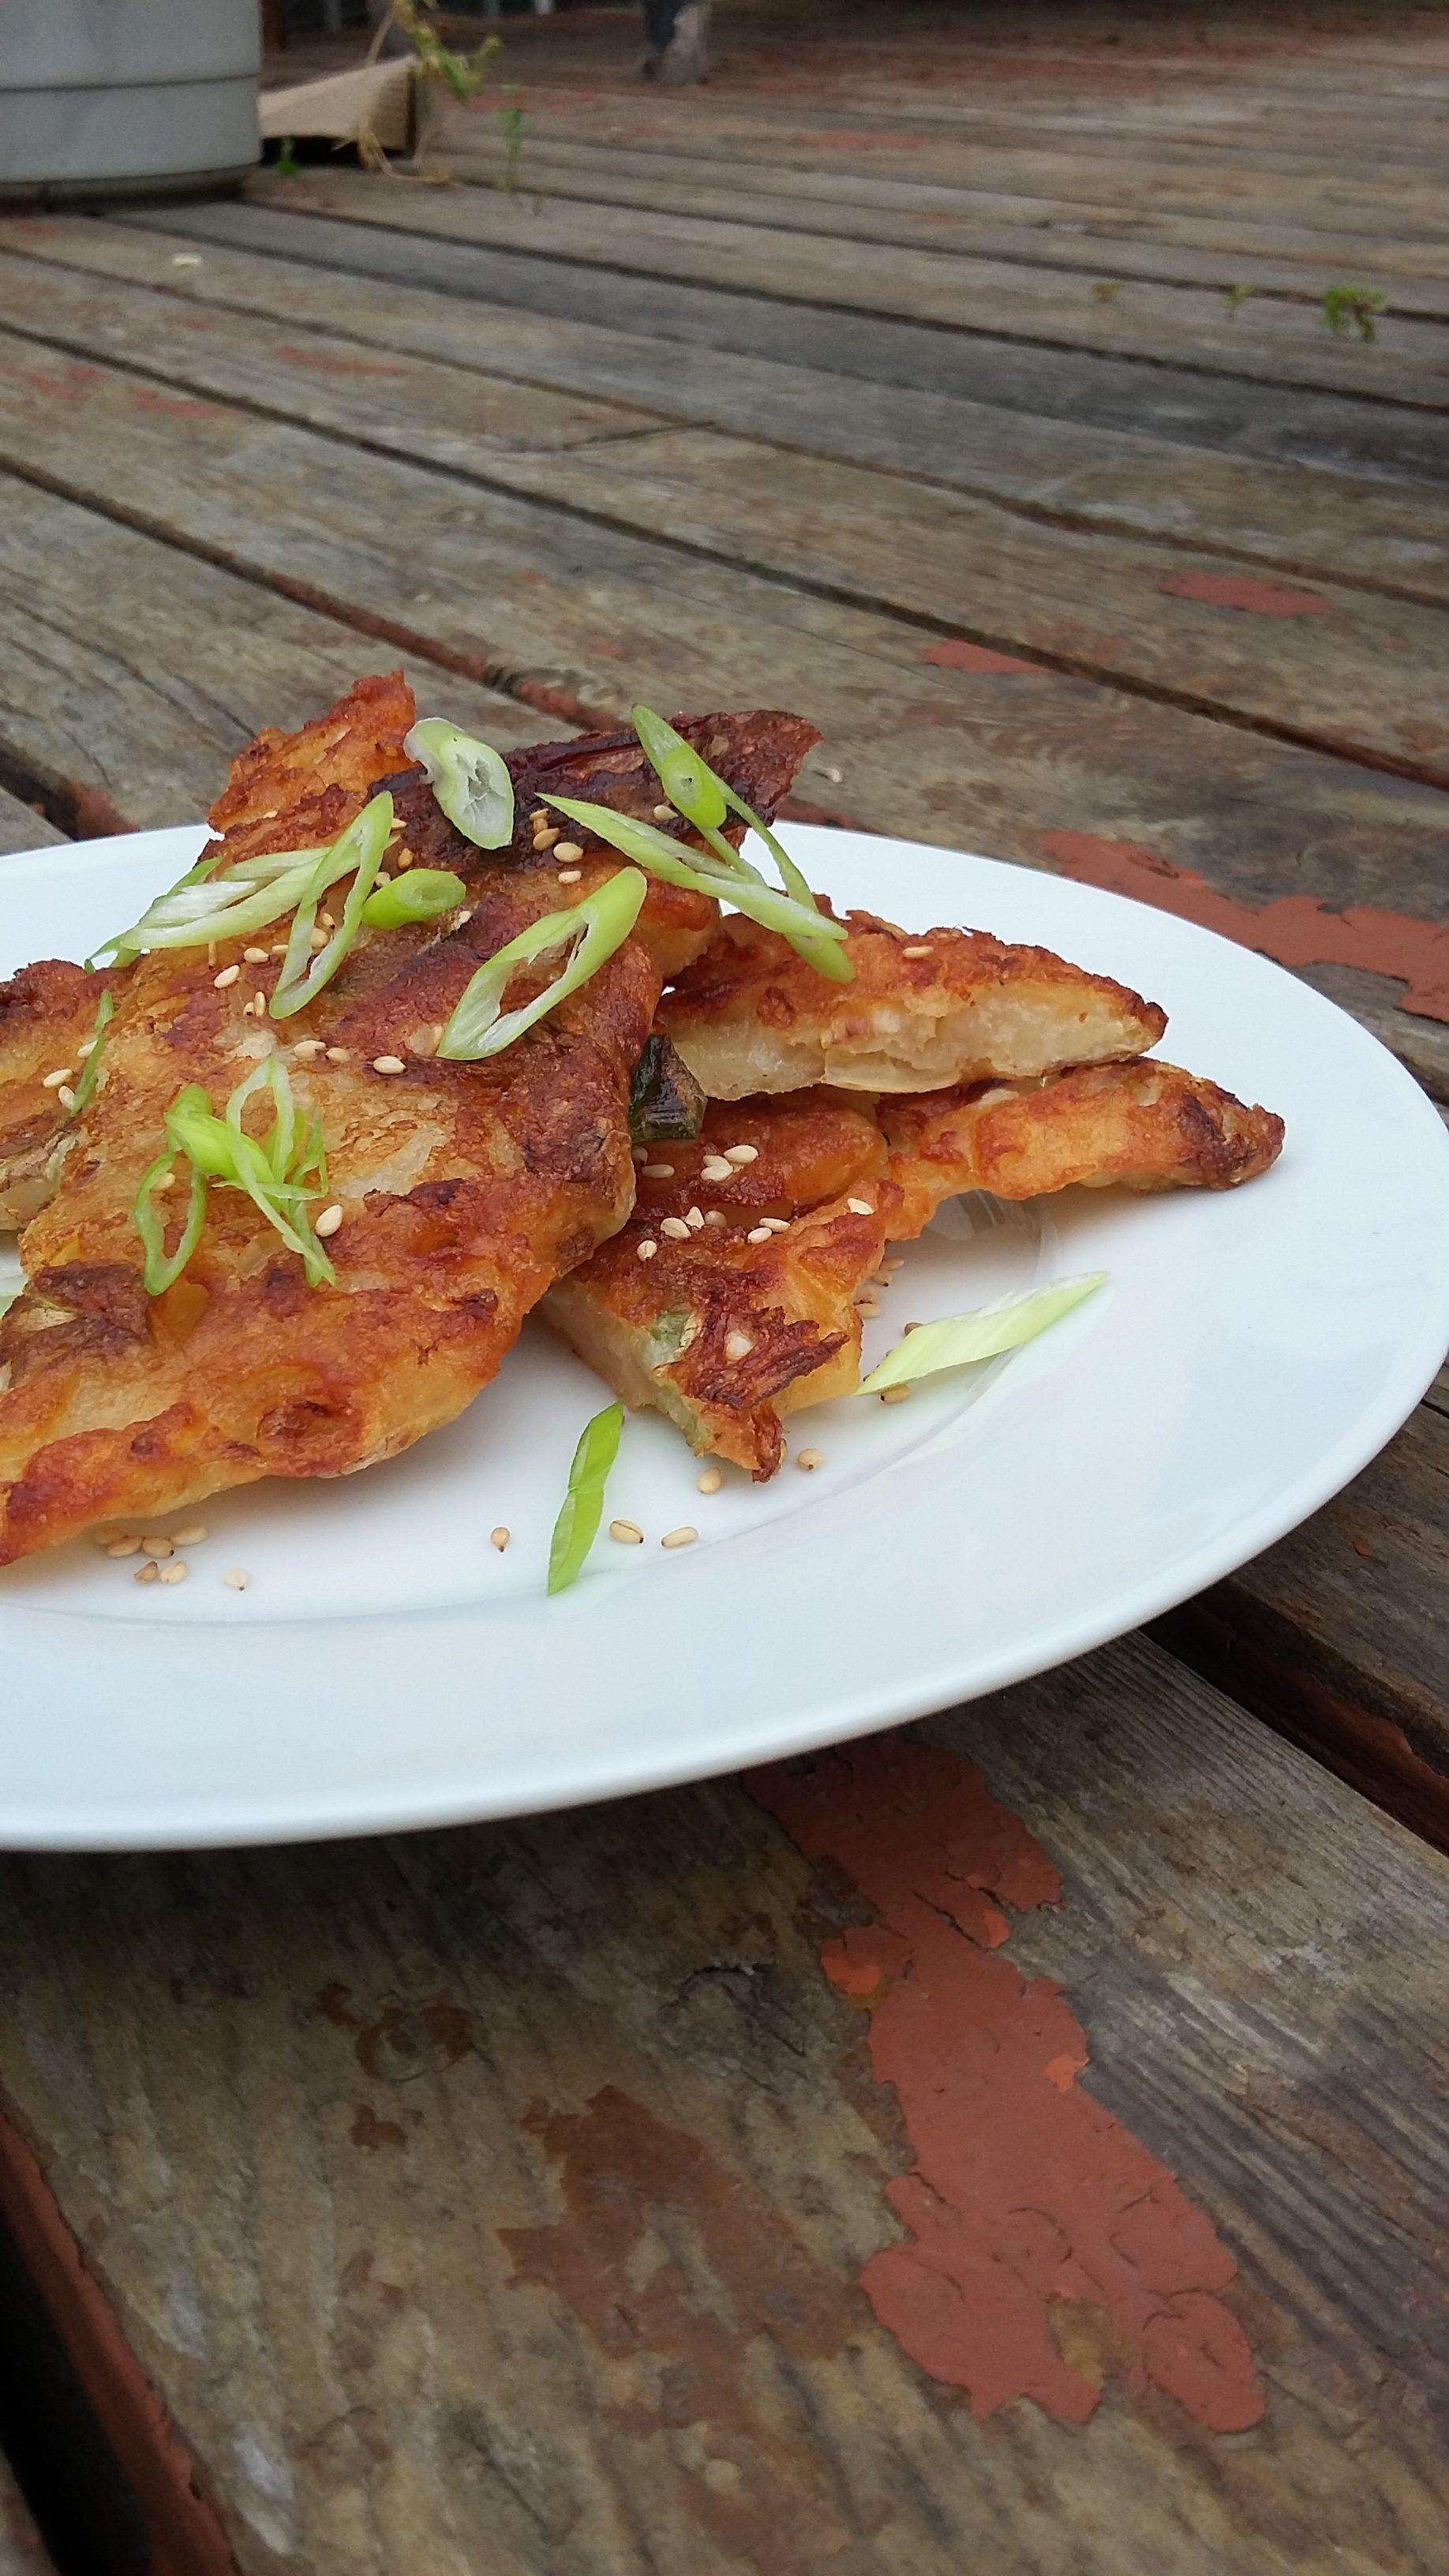 A plate of crispy kim chi pancakes